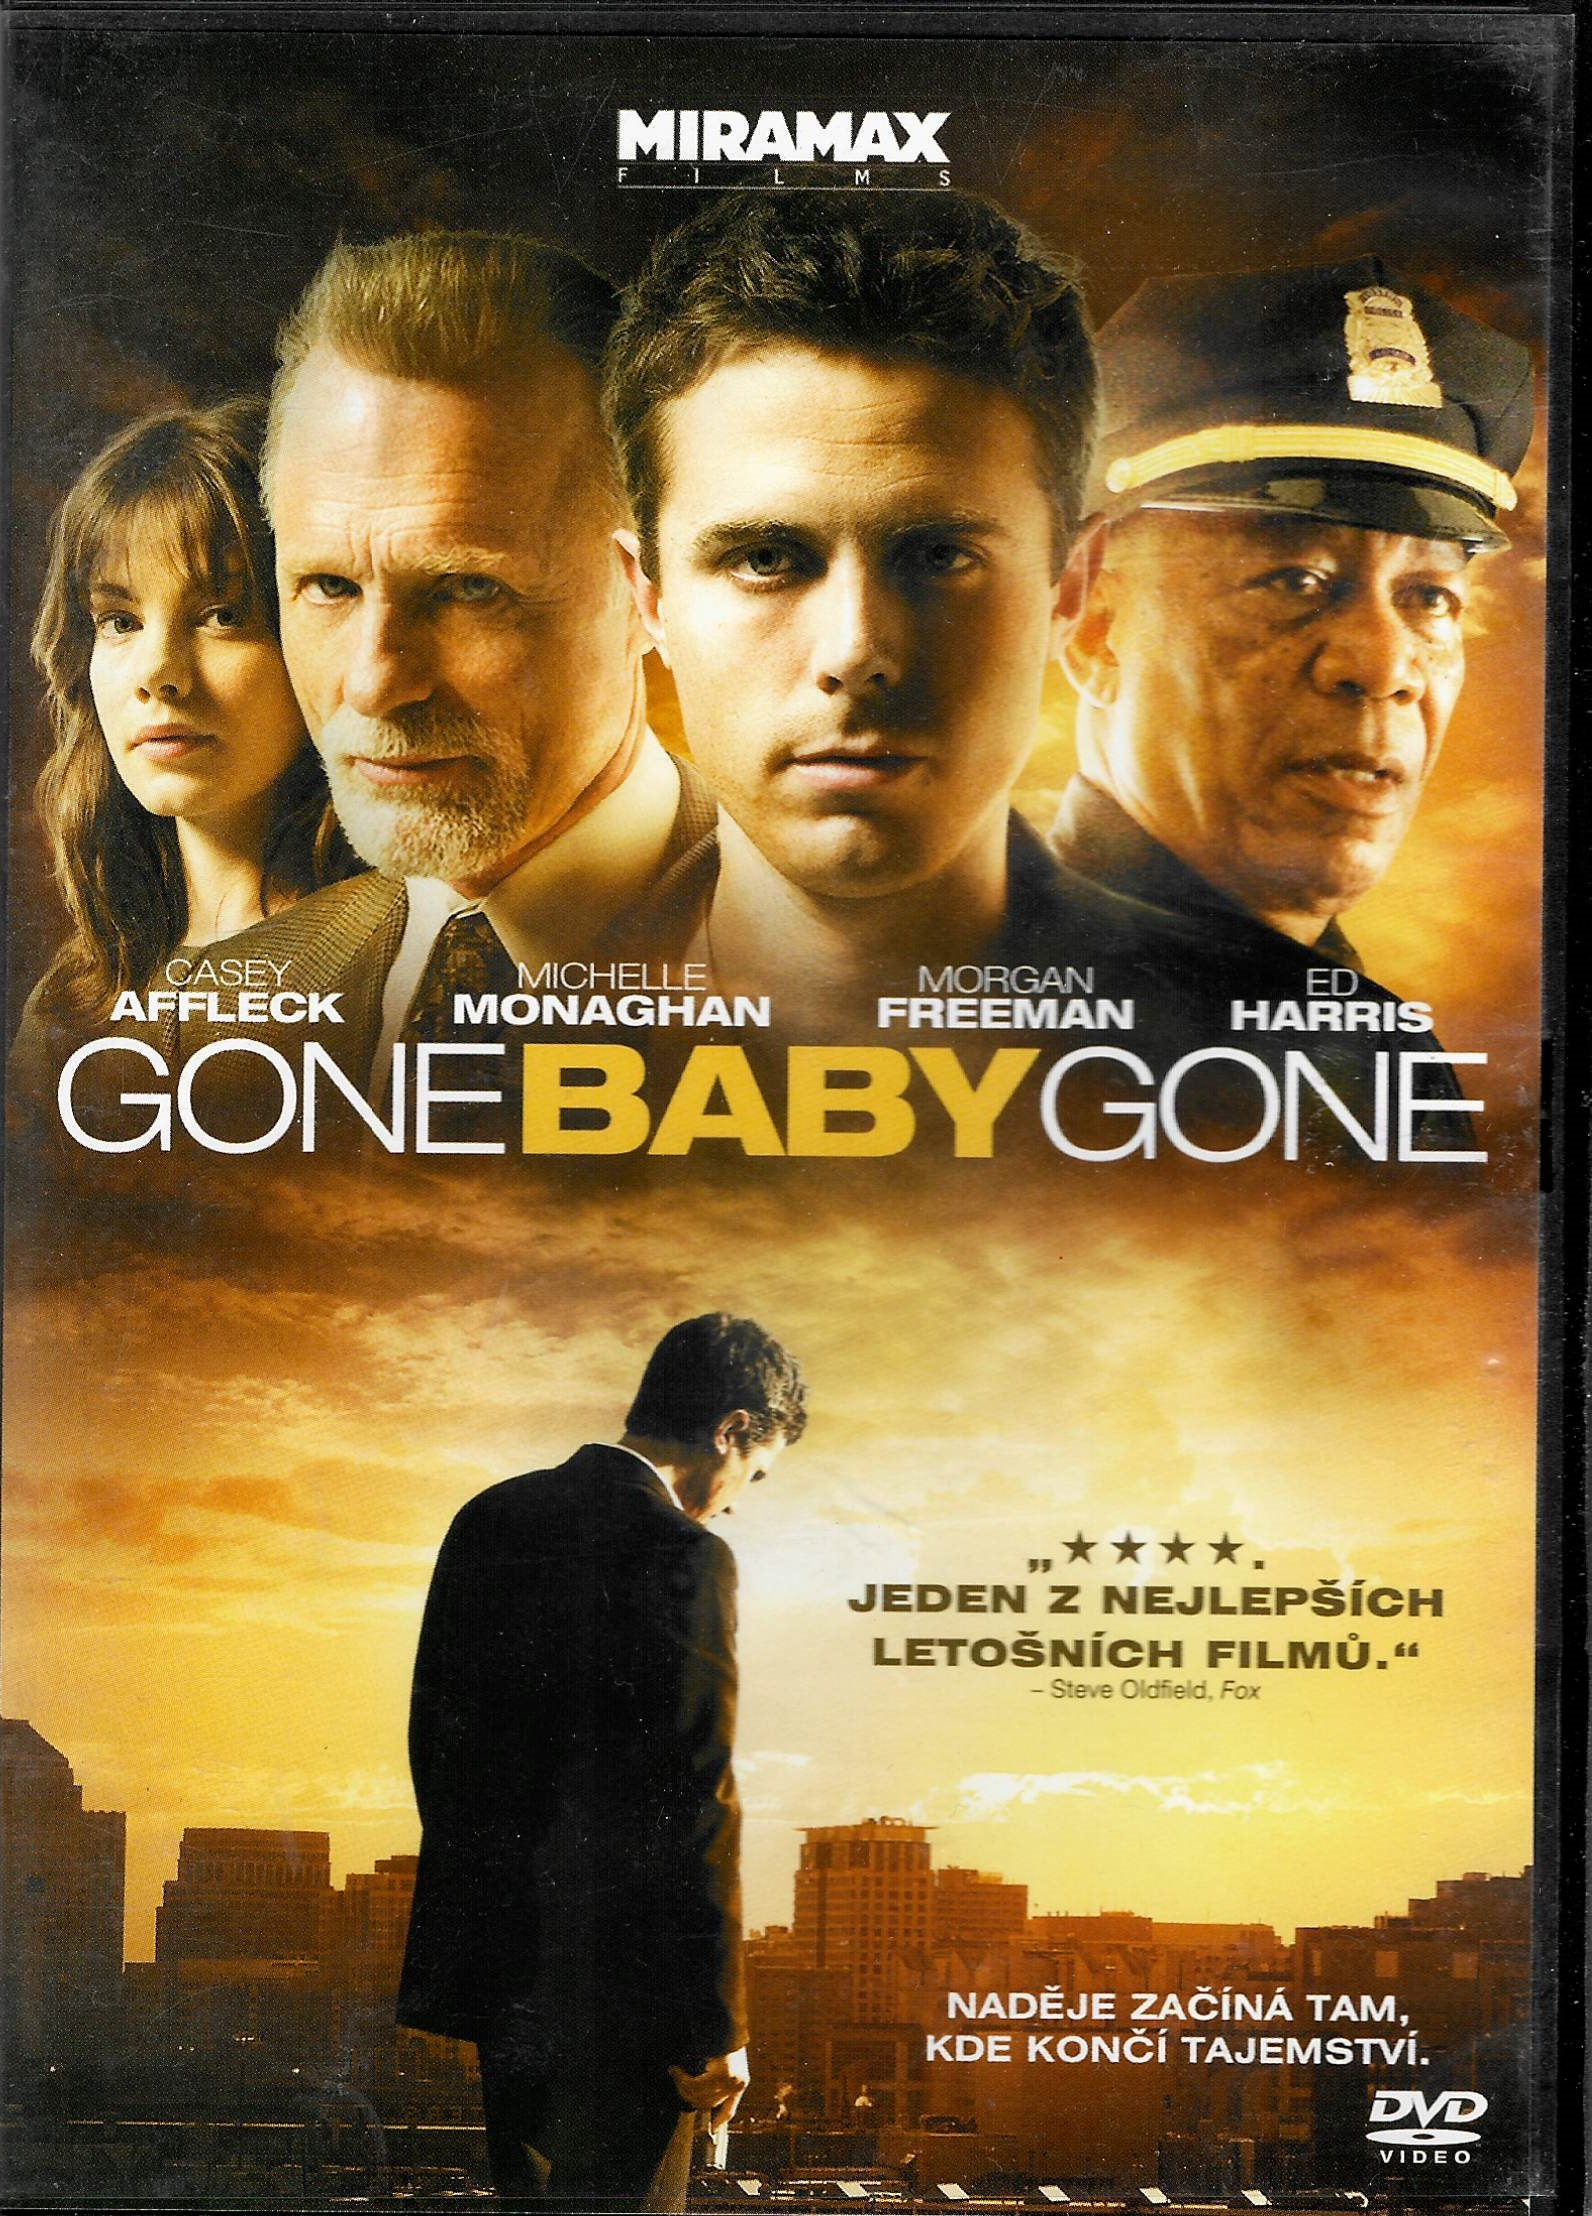 Gone baby gone - DVD